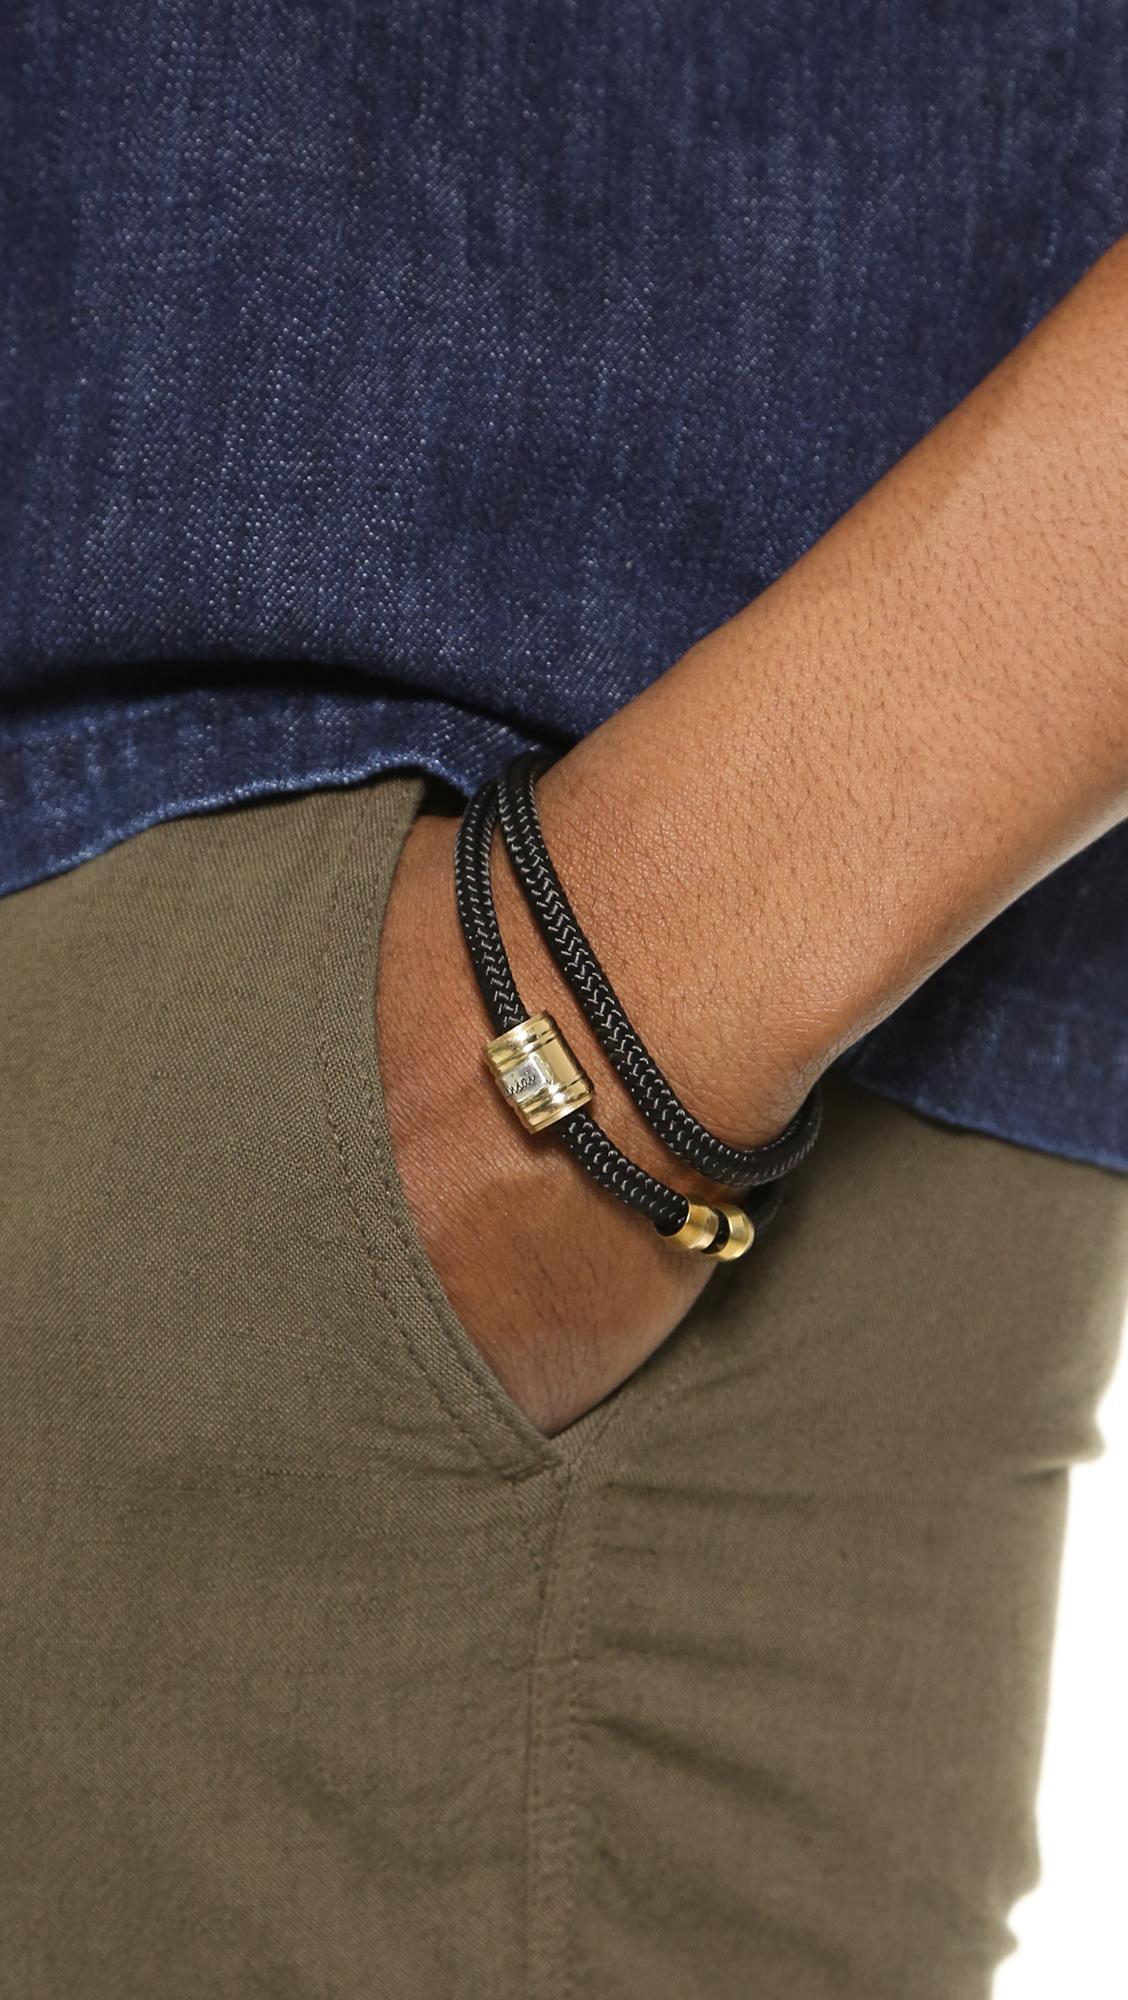 Miansai Casing rope bracelet sreoN3clo